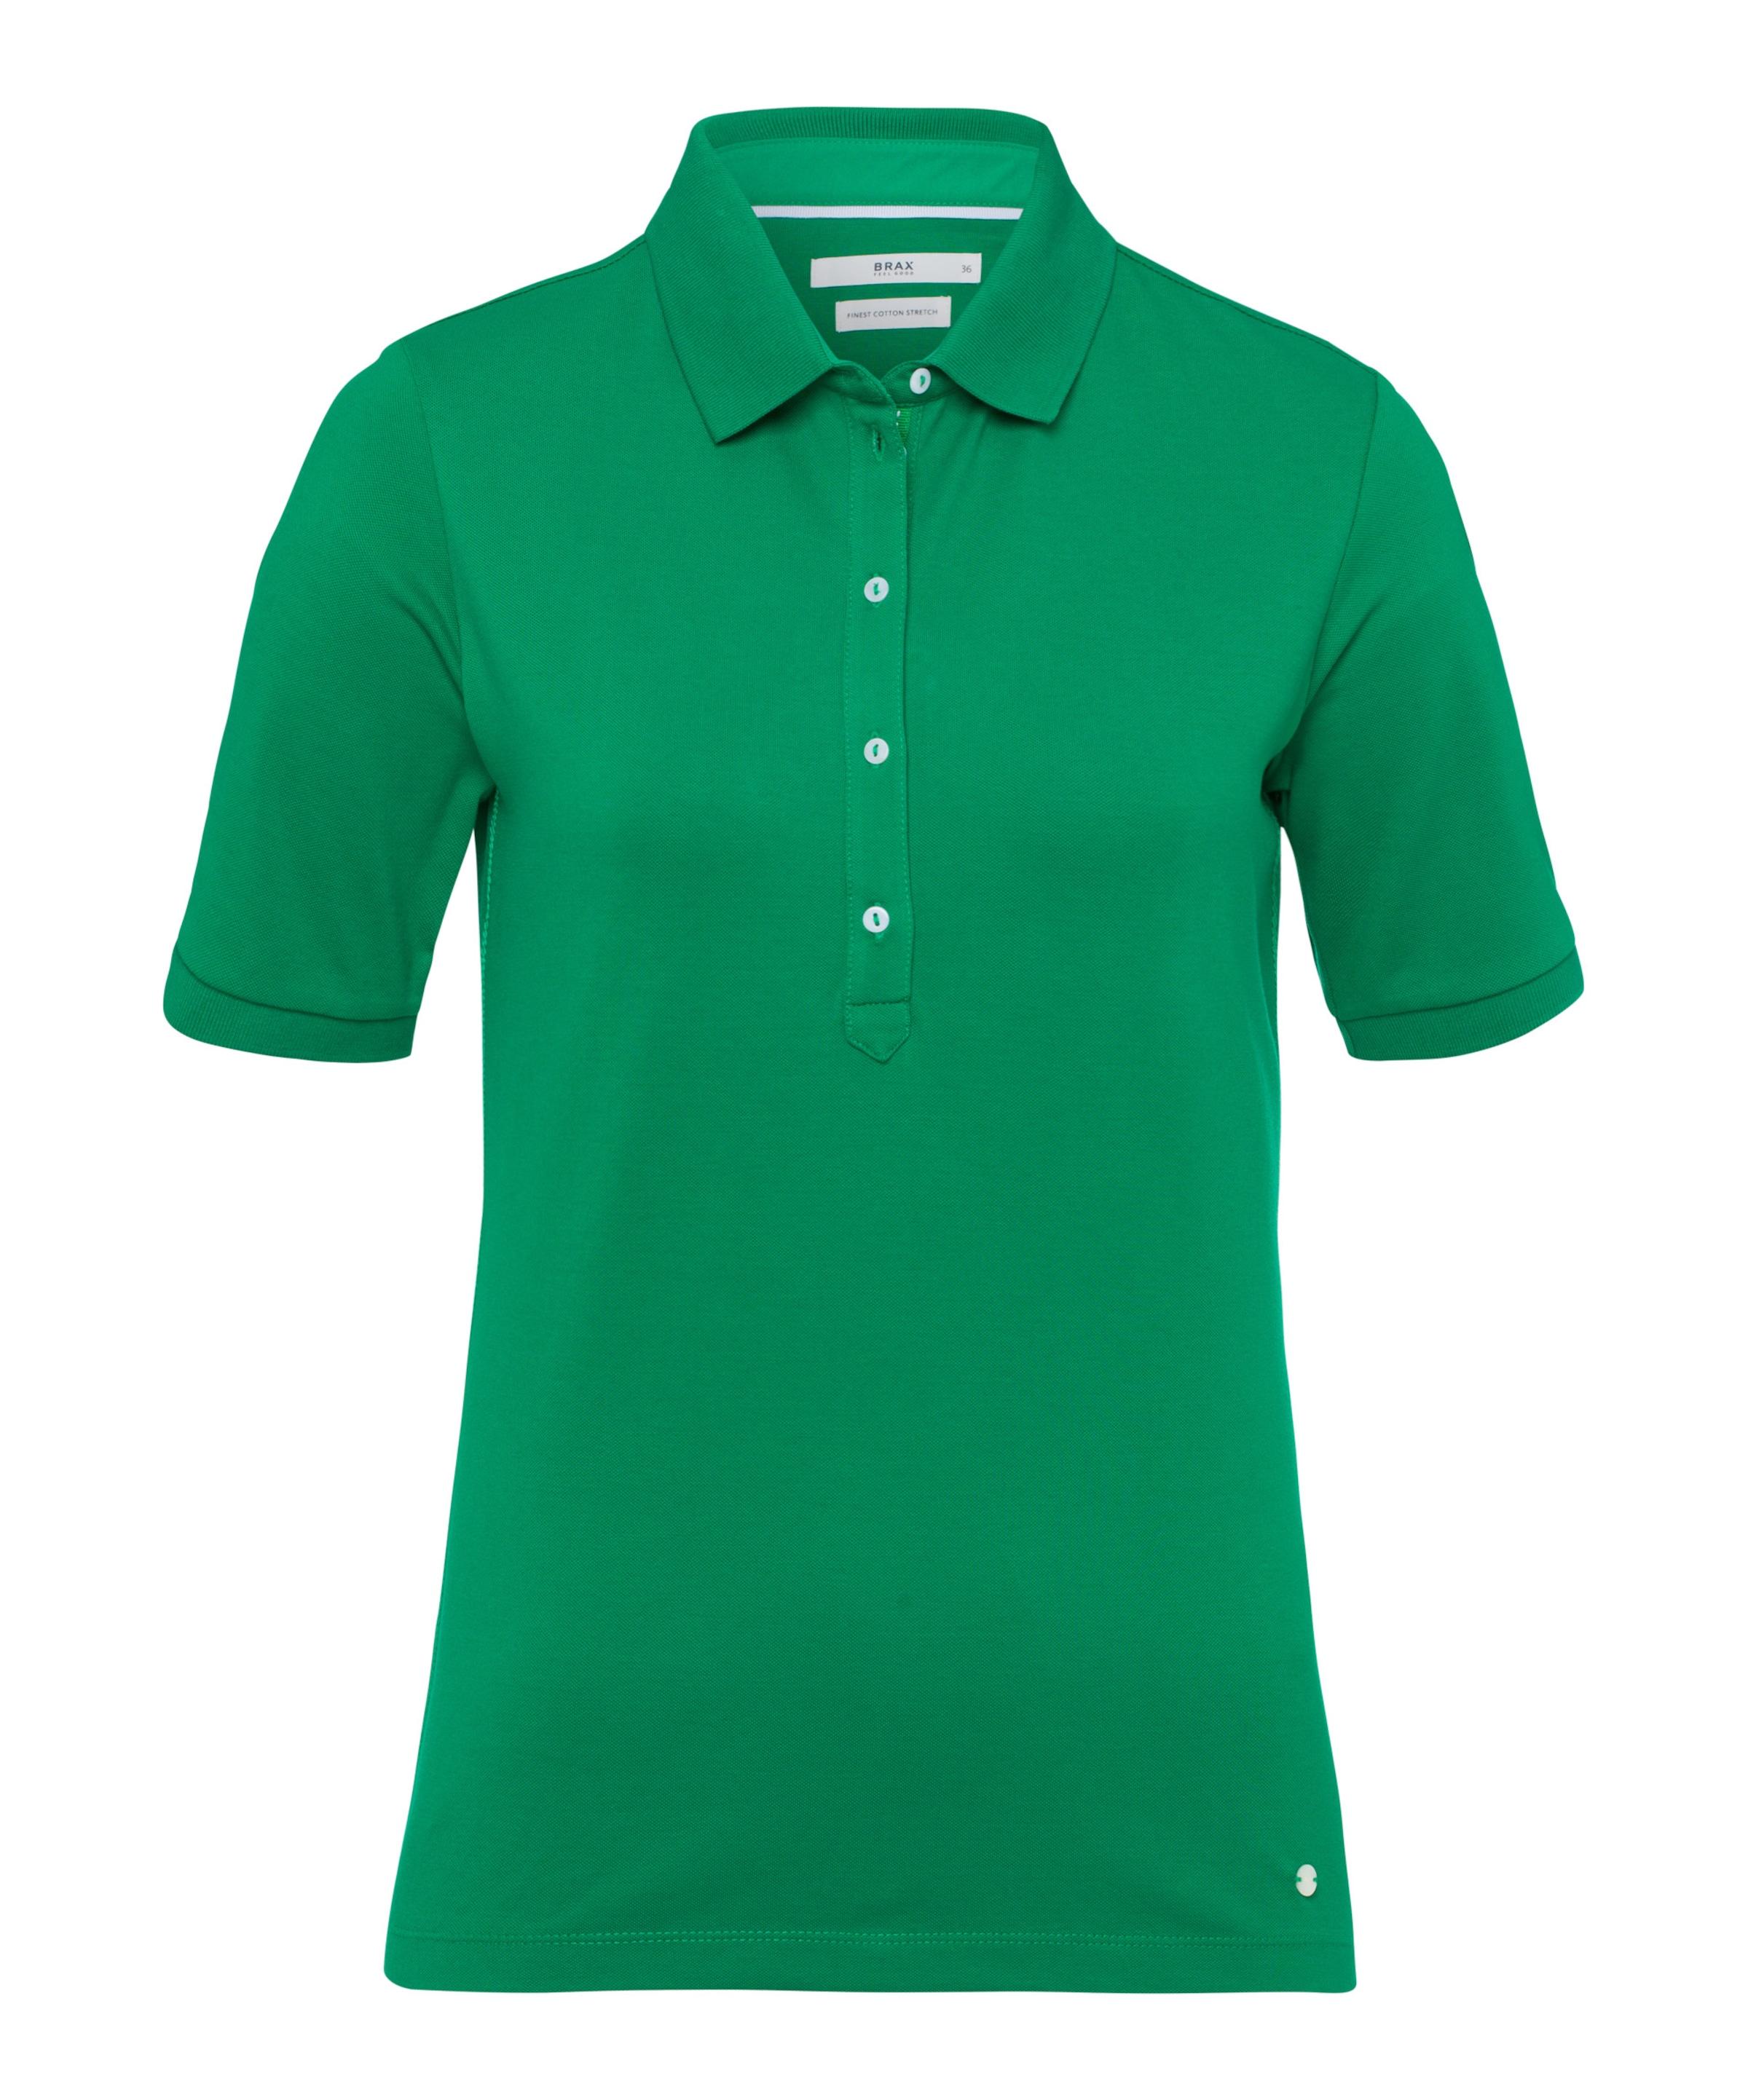 'cleo' Poloshirt Grün In Brax kZuPXOi